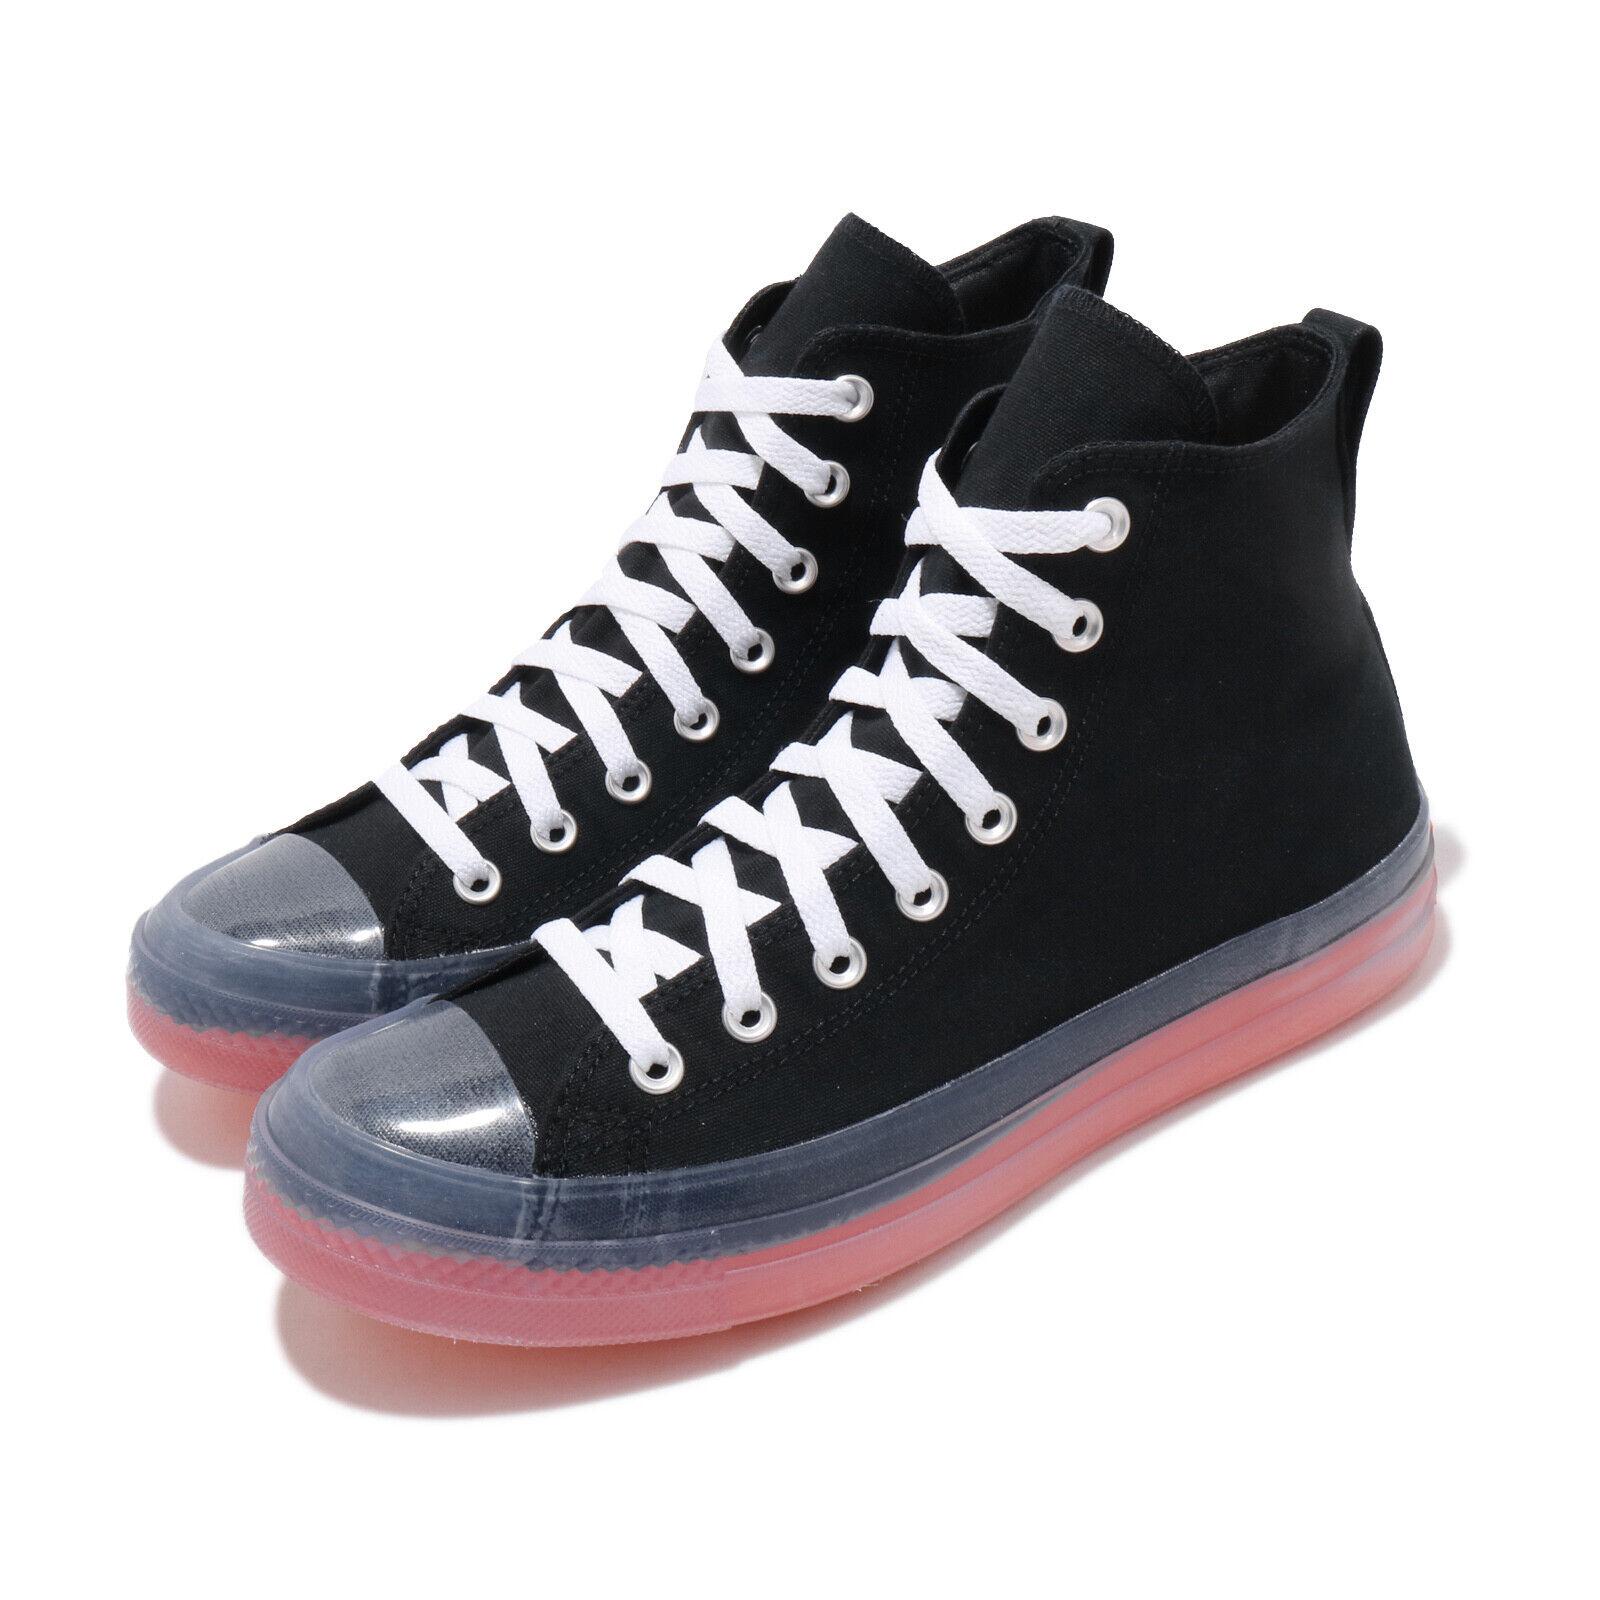 Converse Chuck Taylor All Star CX Black Wild Mango Men Women Unisex Shoe 167809C